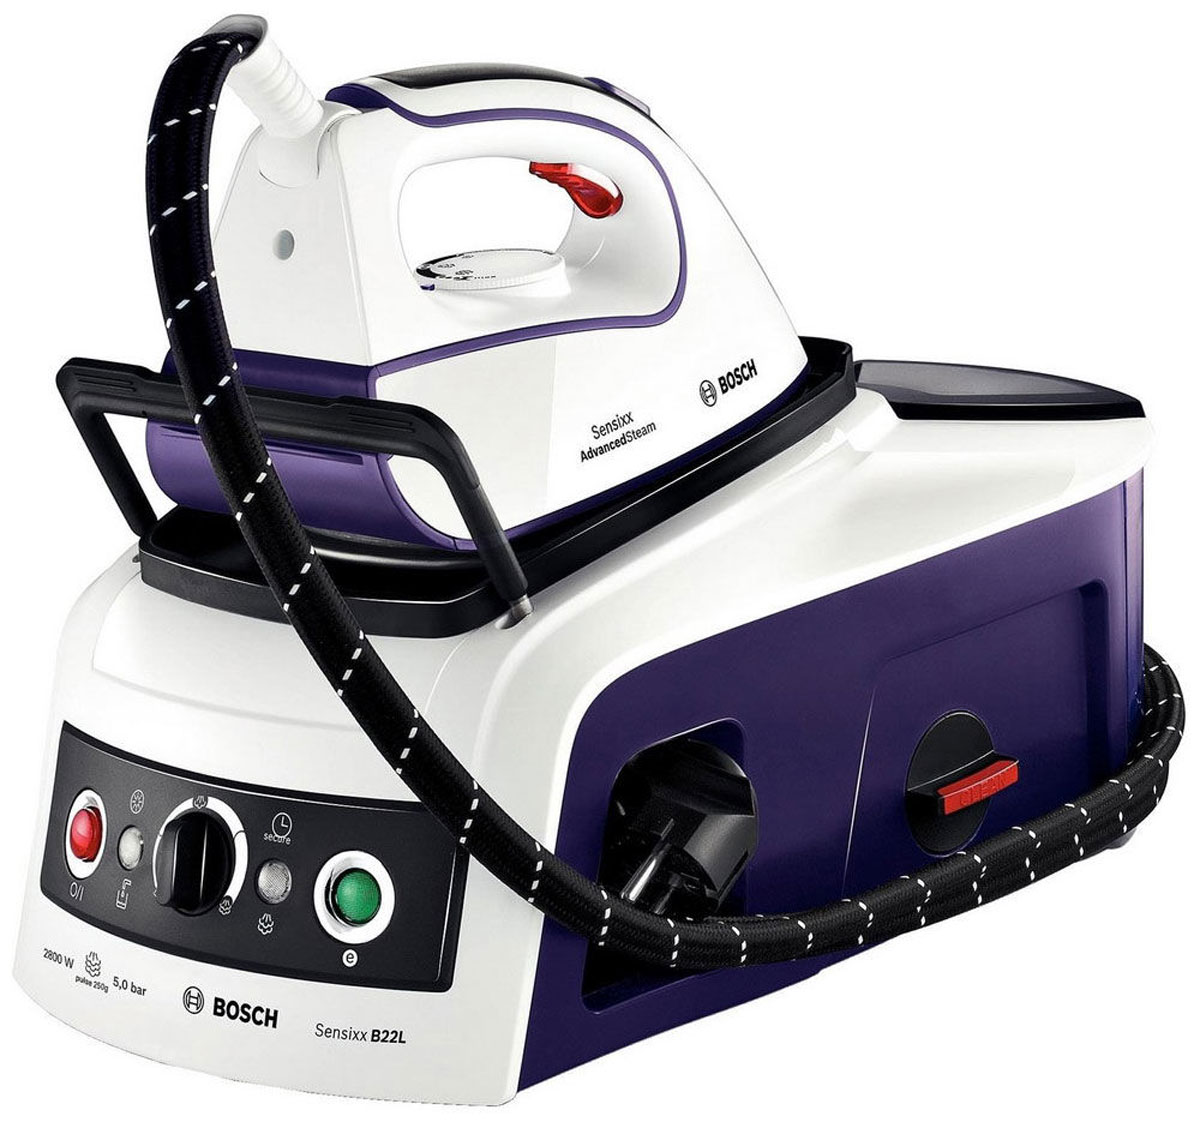 Bosch TDS2241, White Purple гладильная система - Гладильные системы